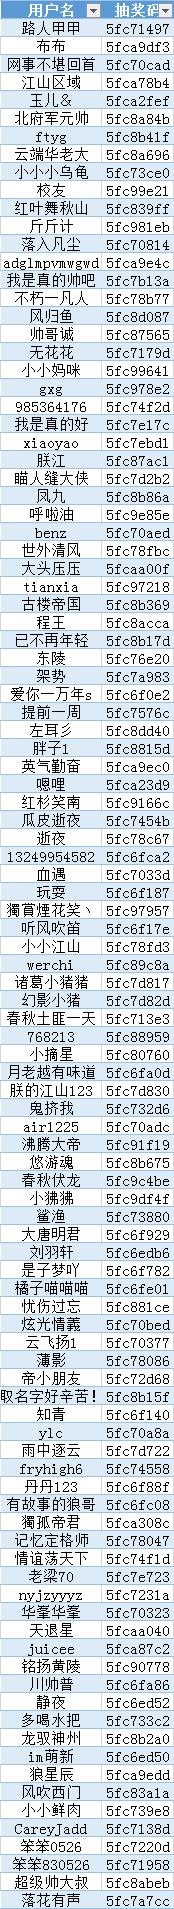 12-9 江山.png